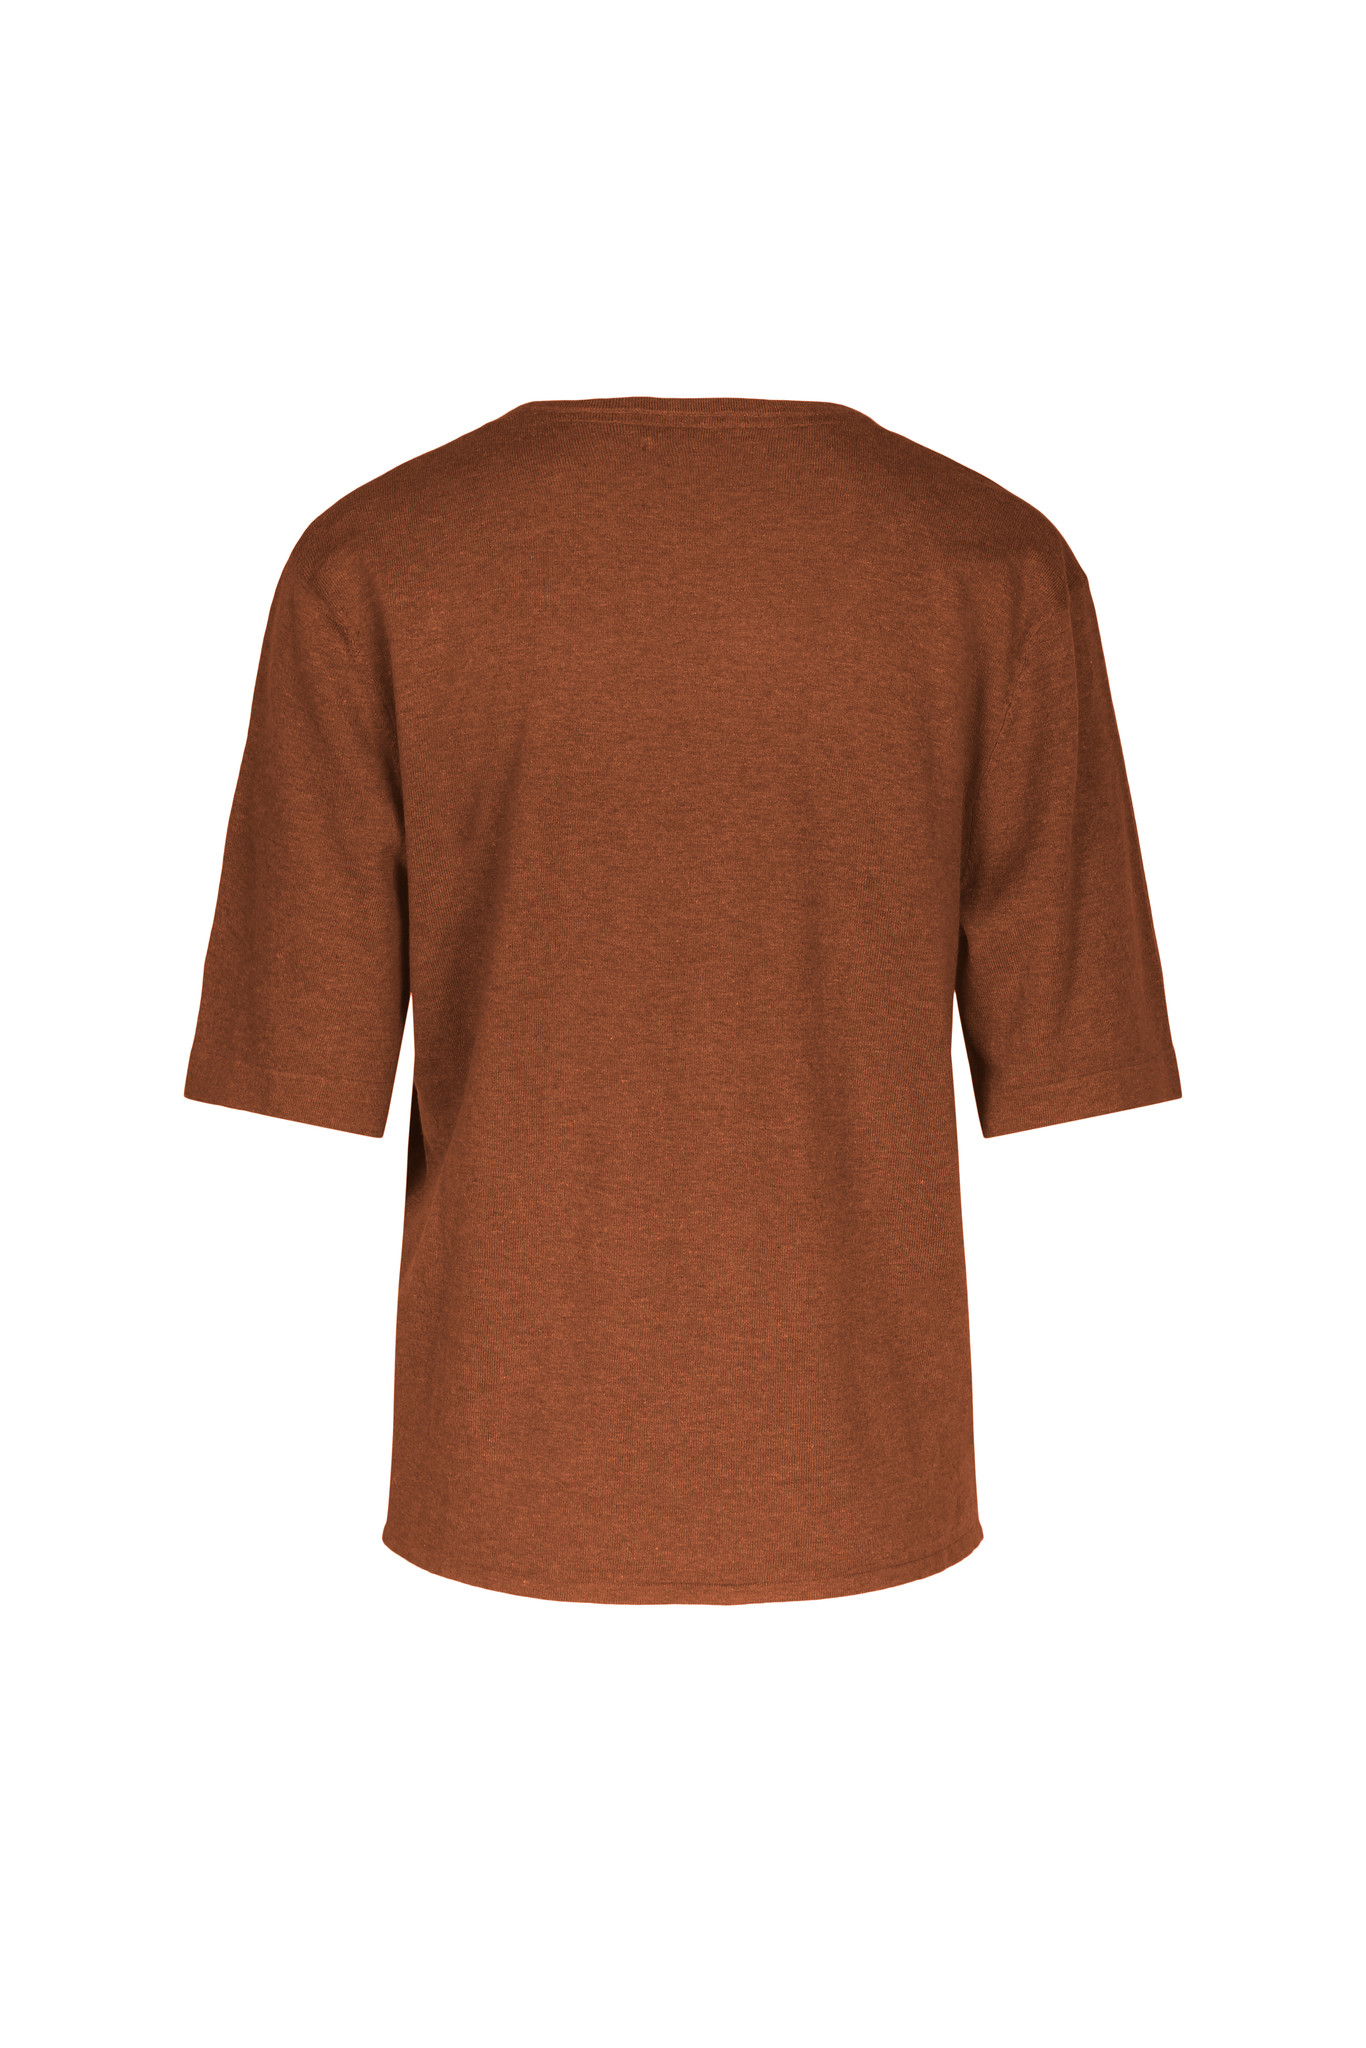 Joe Knitted Tee - Caramel Melange-2